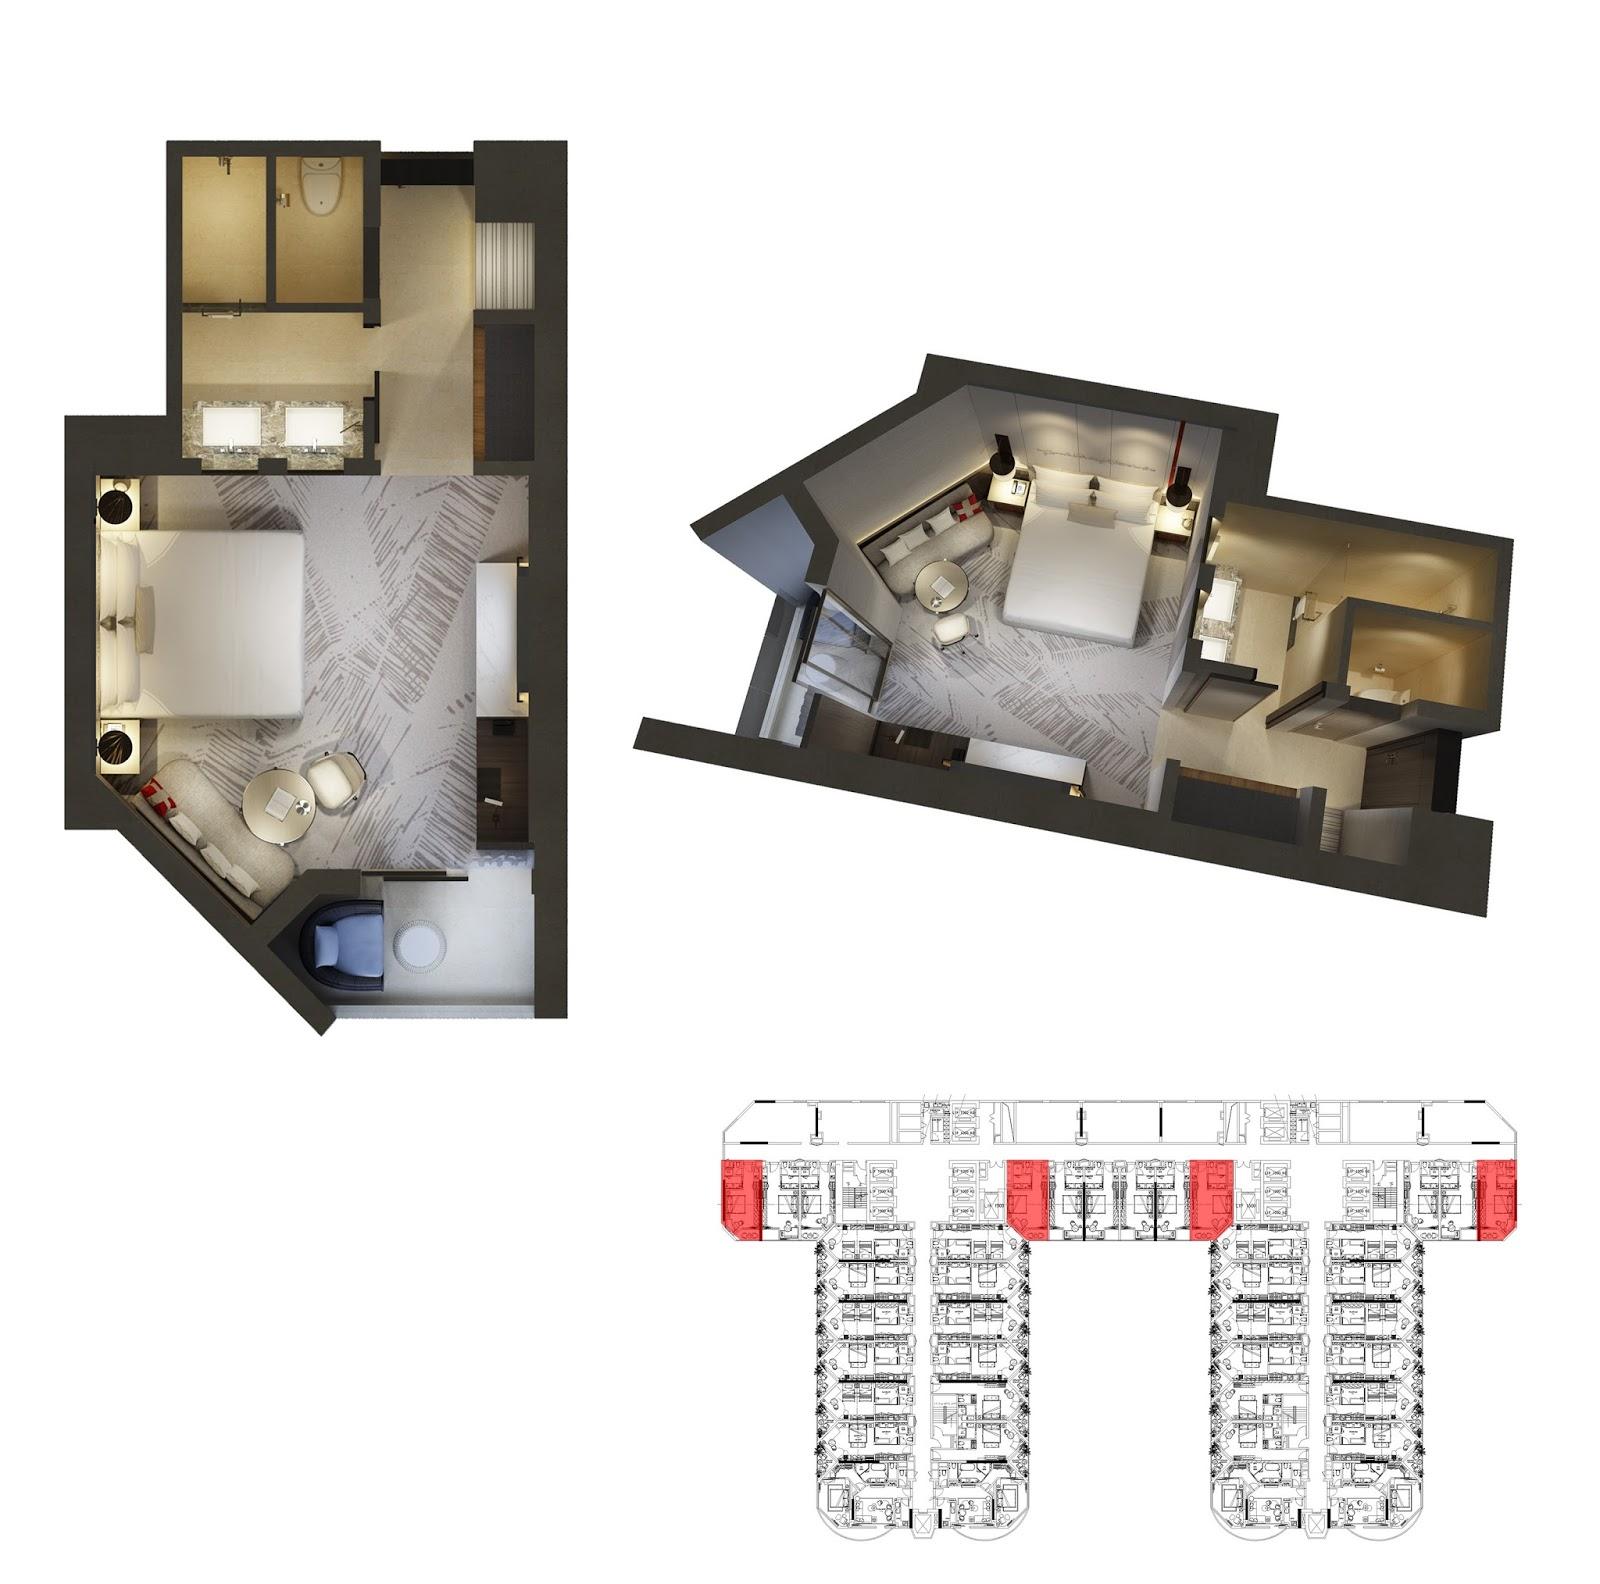 Thiết kế căn hộ số 6 Swisstouches La Luna Resort